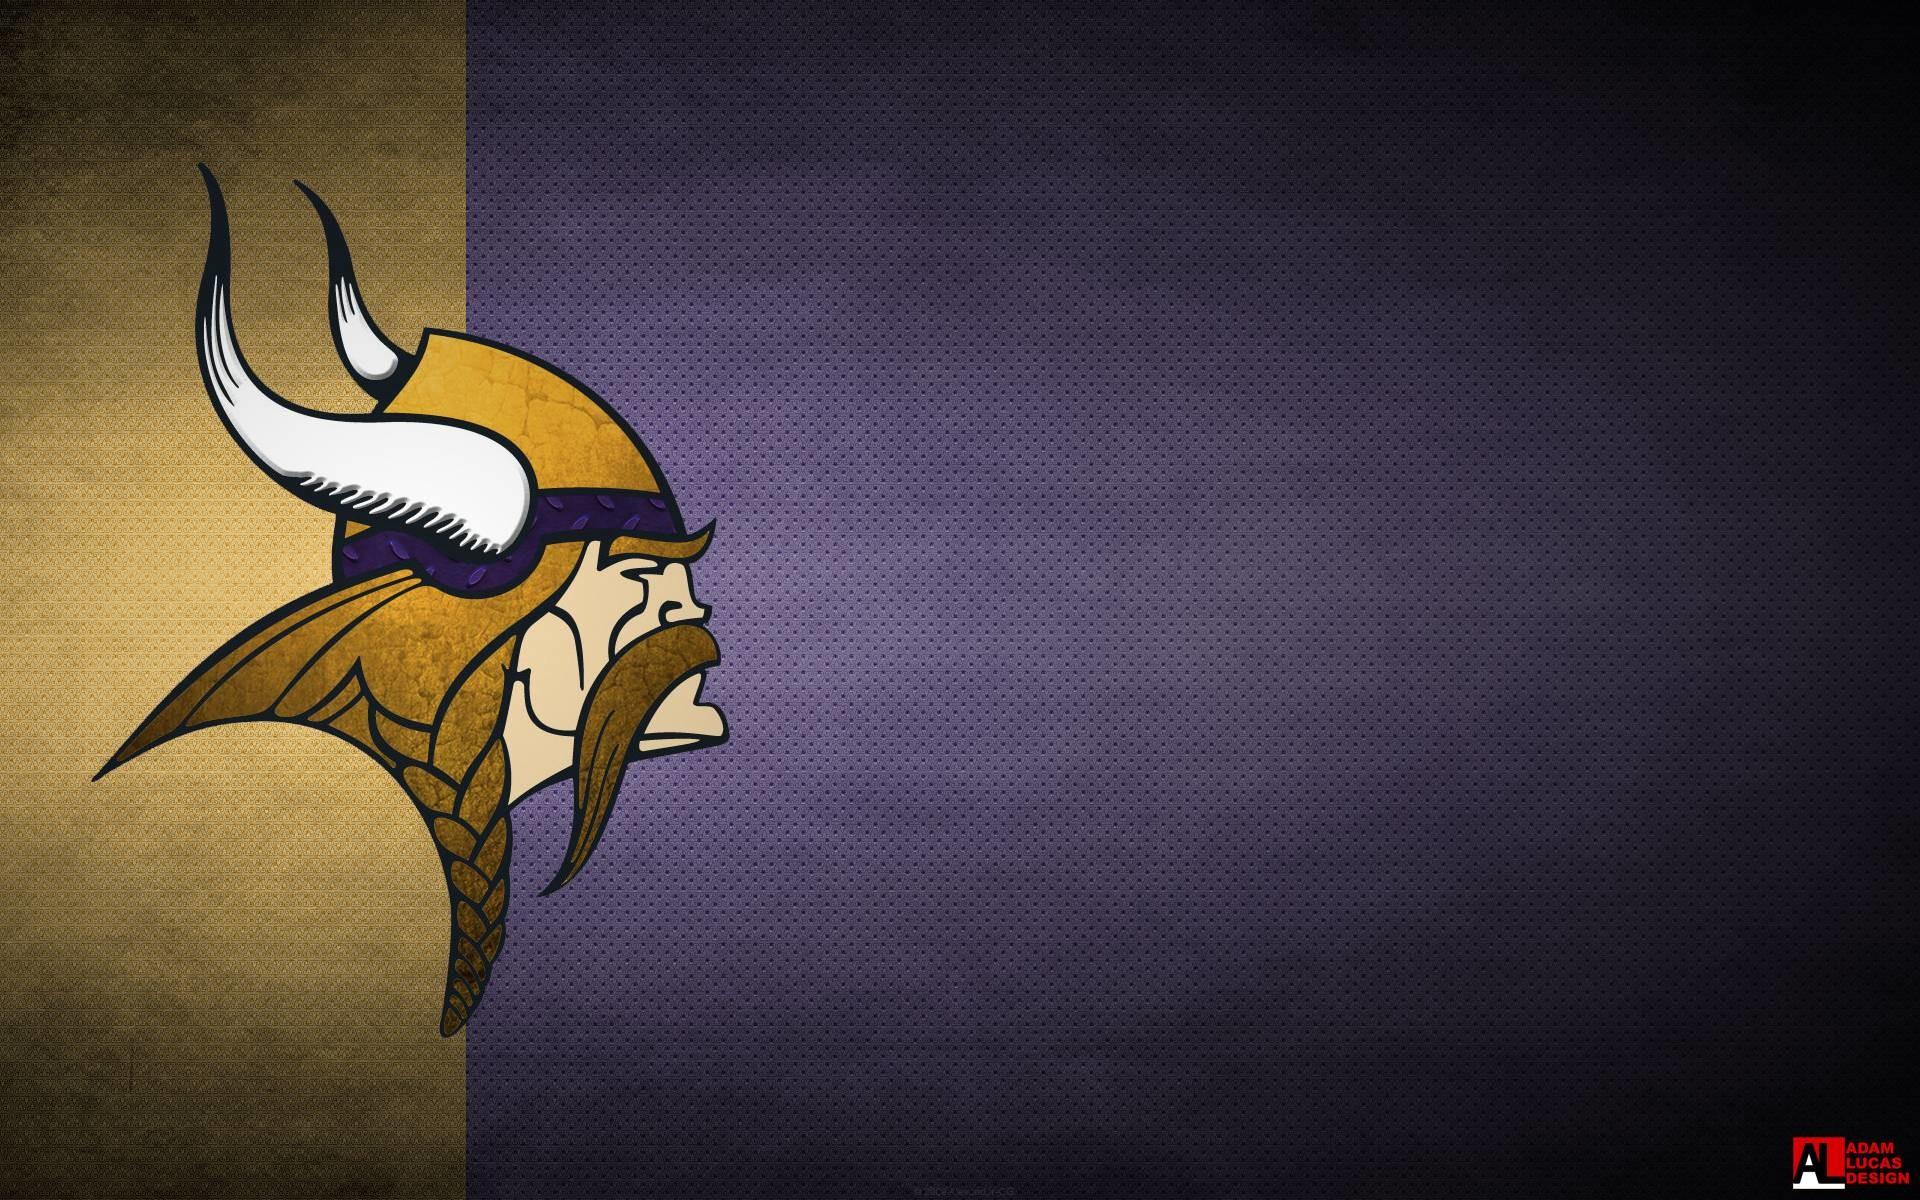 MINNESOTA VIKINGS SELECTION NFL Draft Round Pick